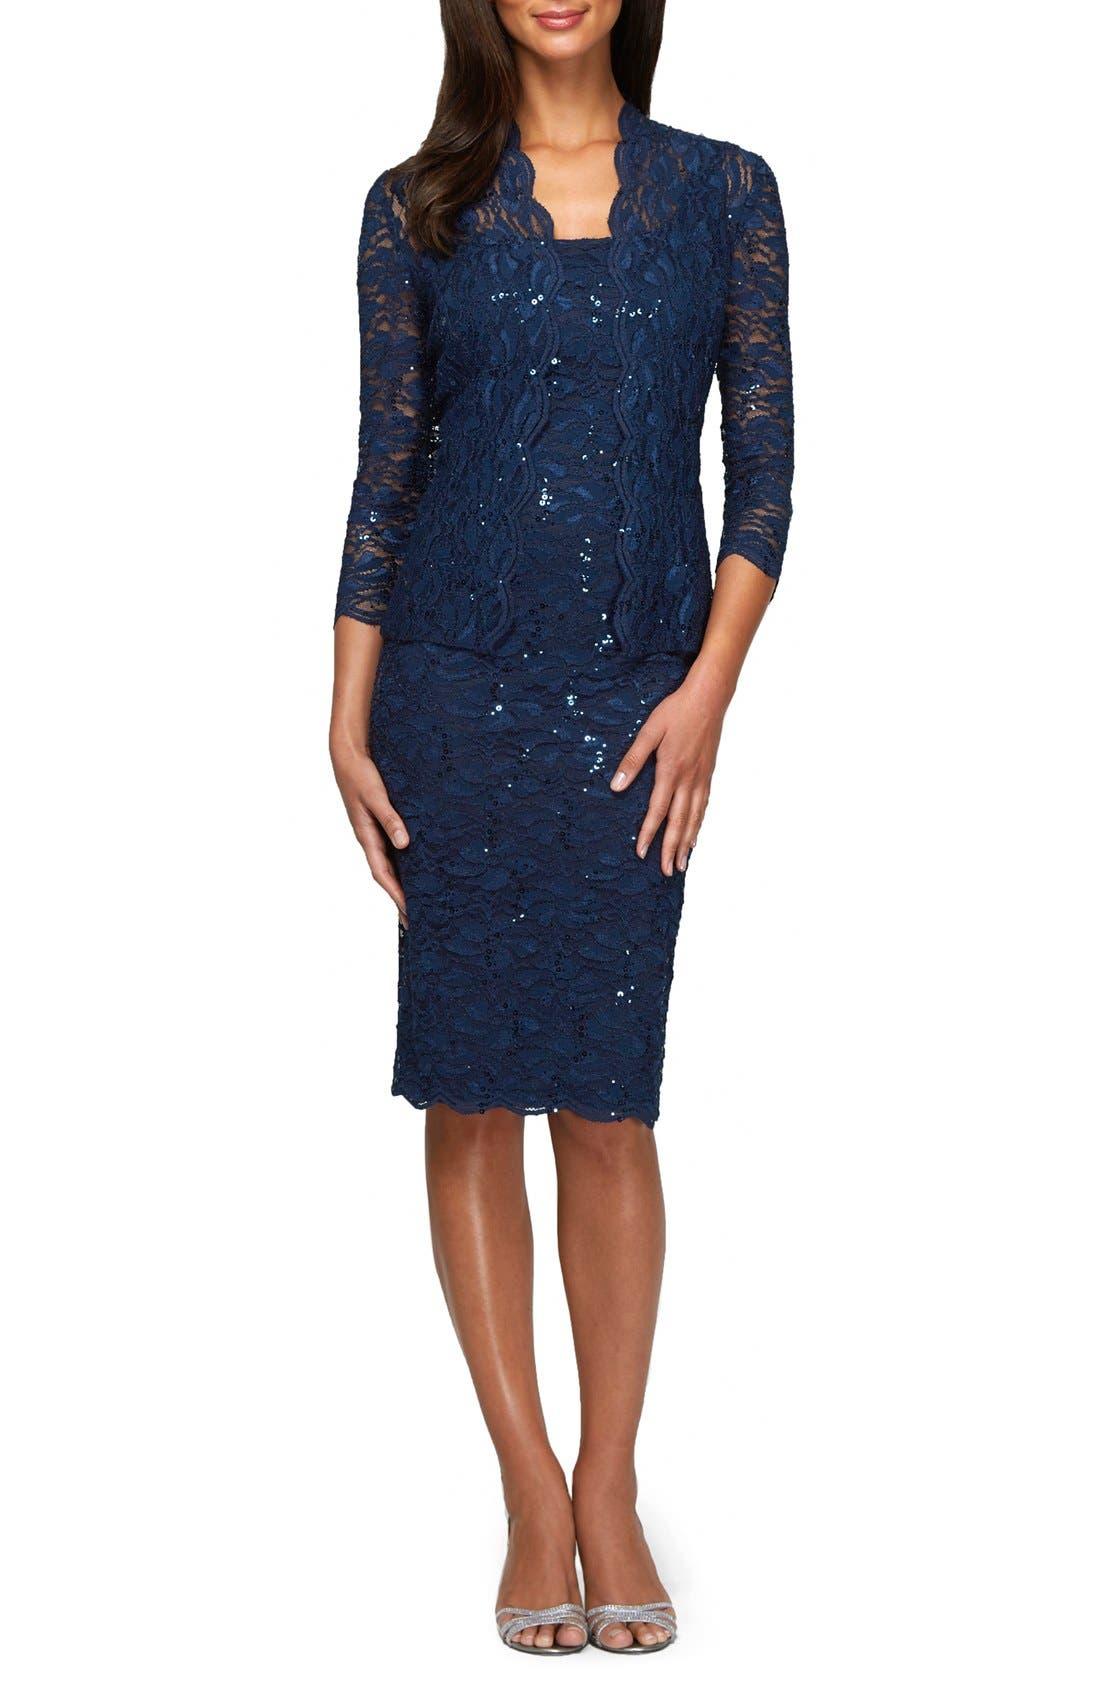 Main Image - Alex Evenings Lace Dress & Jacket (Regular & Petite)